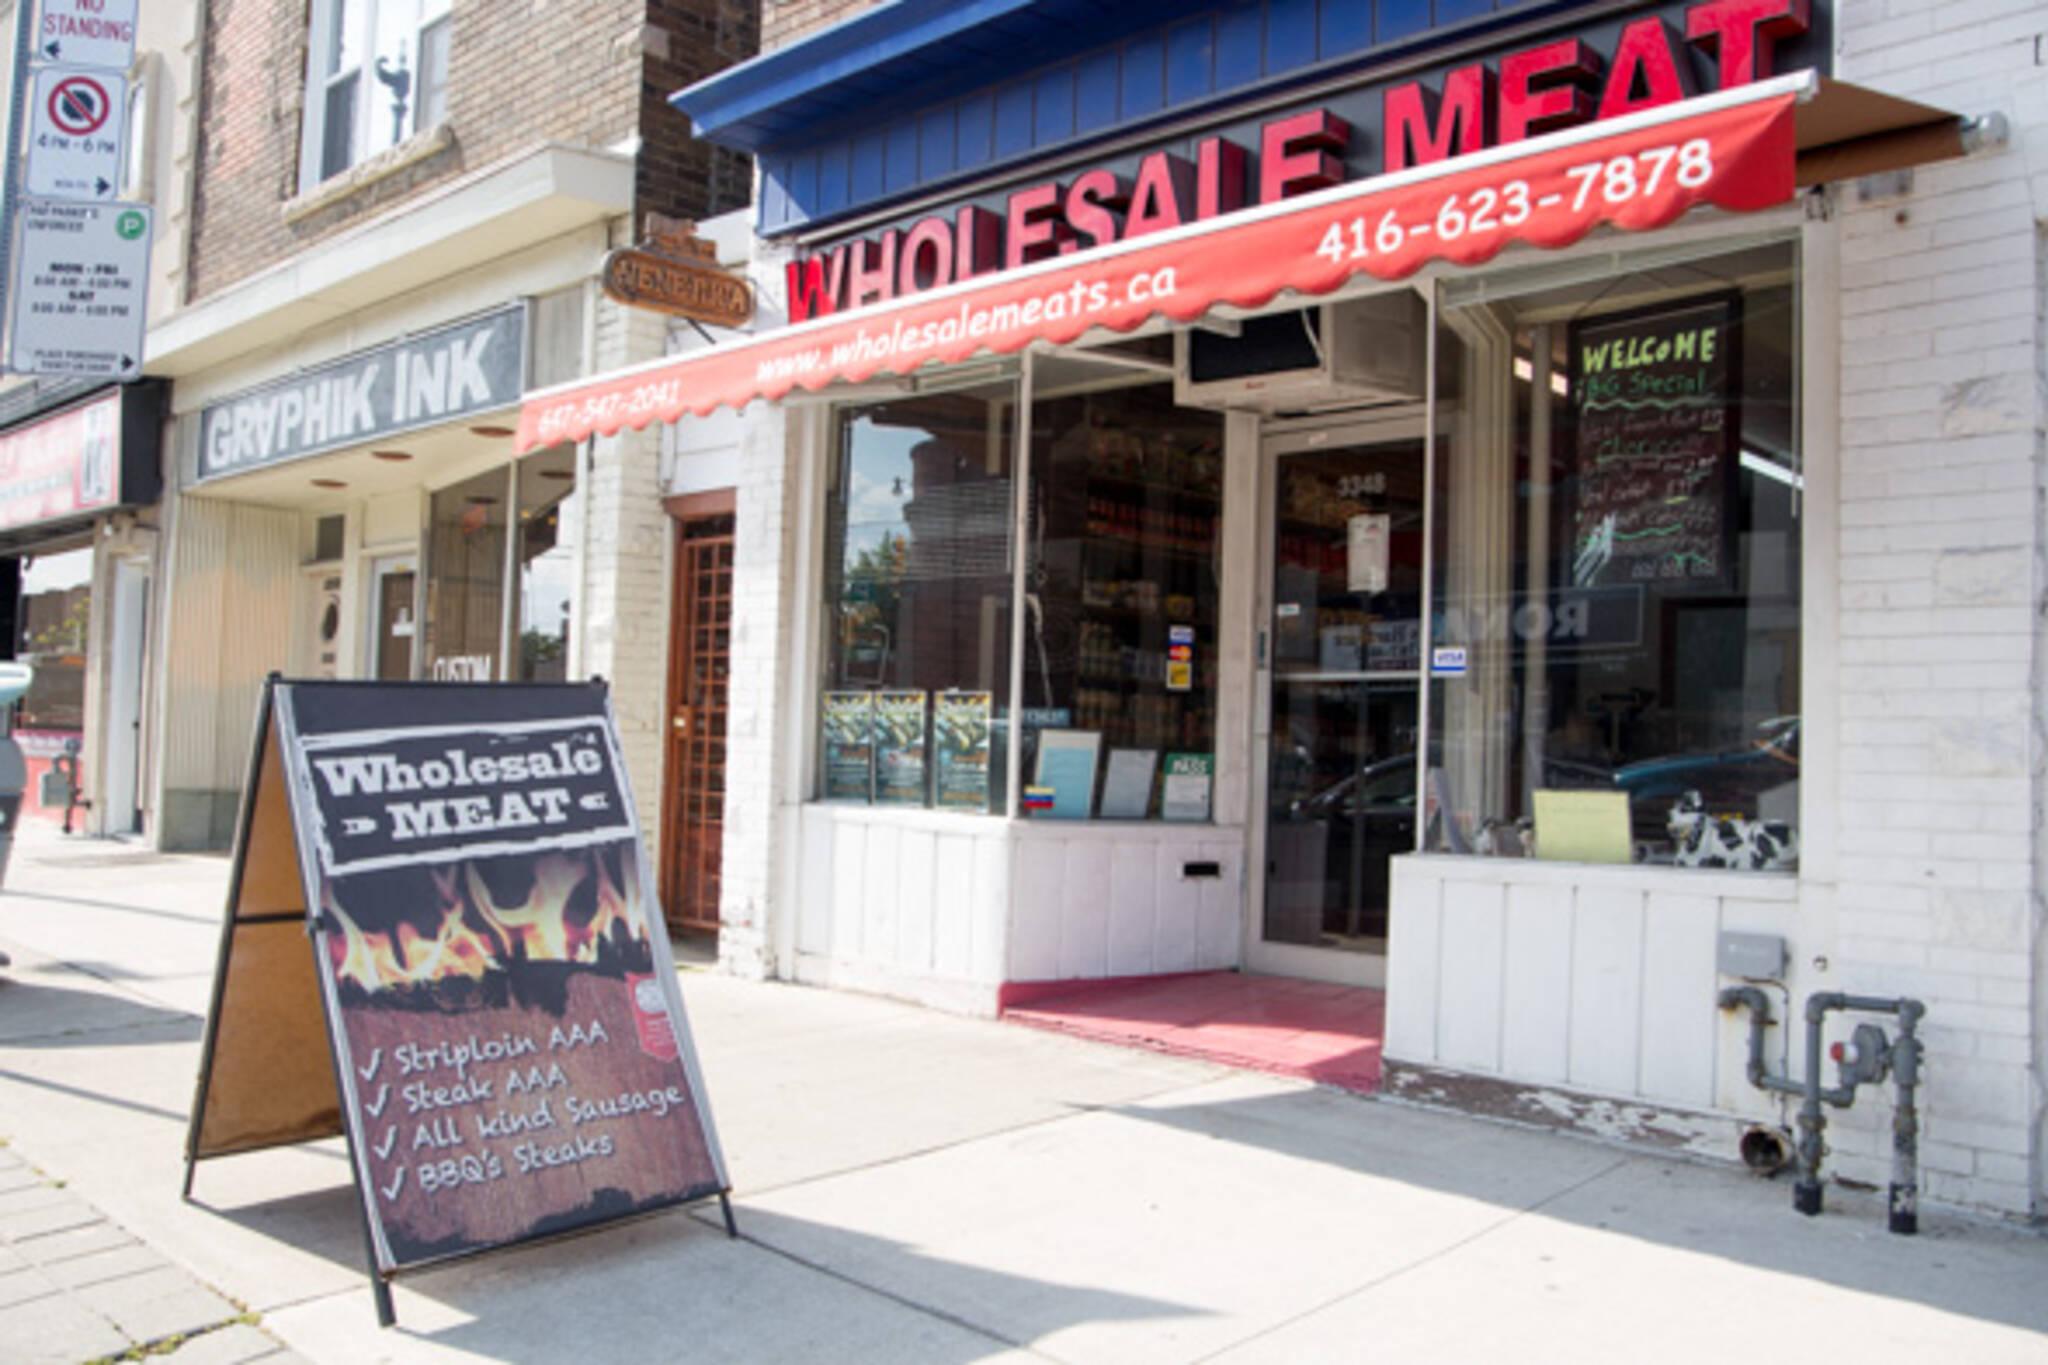 Vene-rica Wholesale Meat Toronto